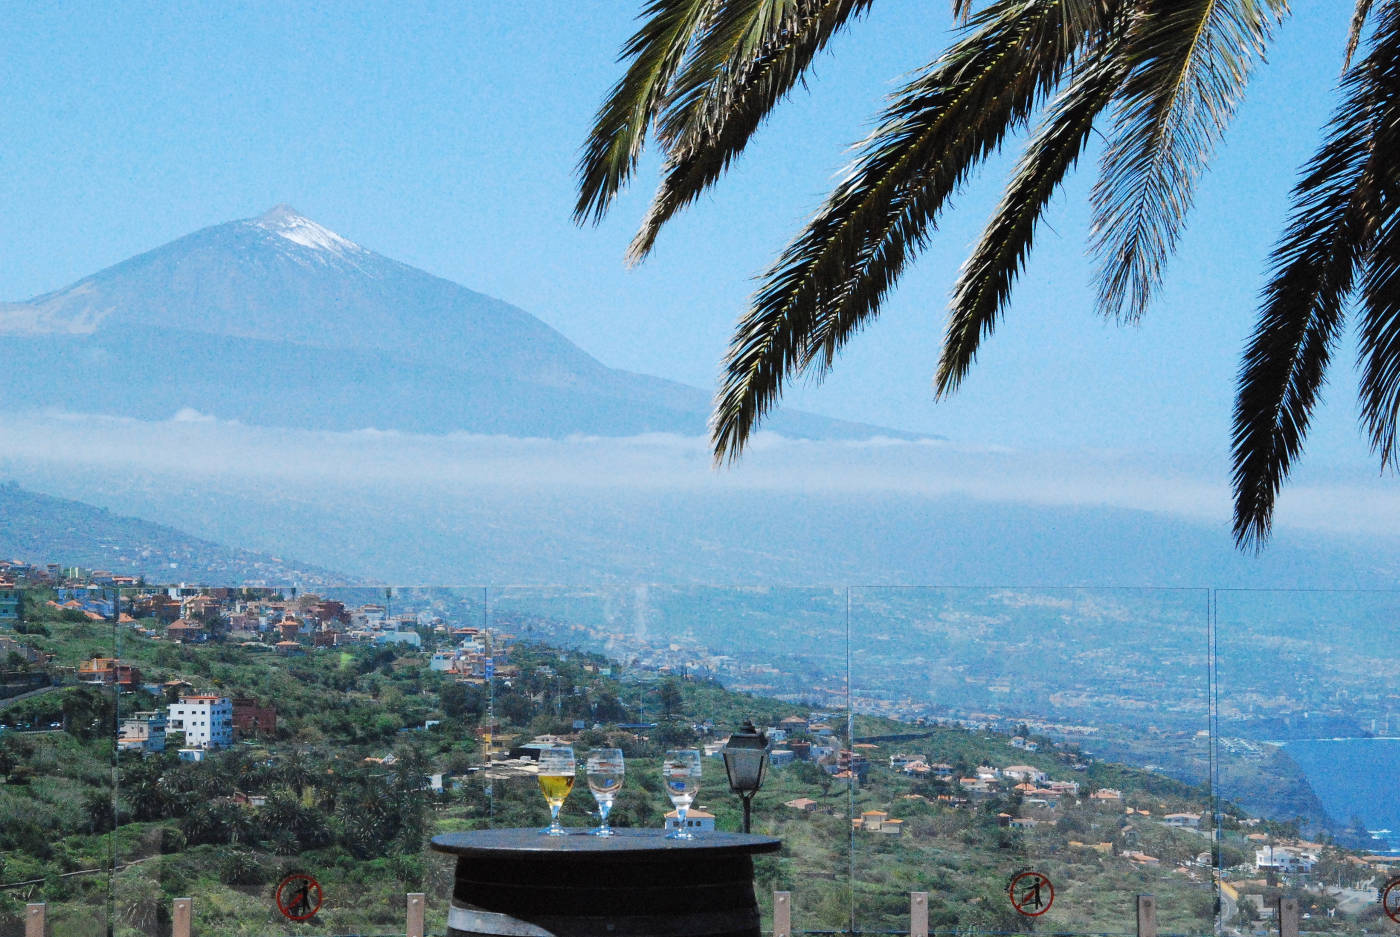 Vue sur le volcan El Teide, à la Casa del Vino à Tenerife